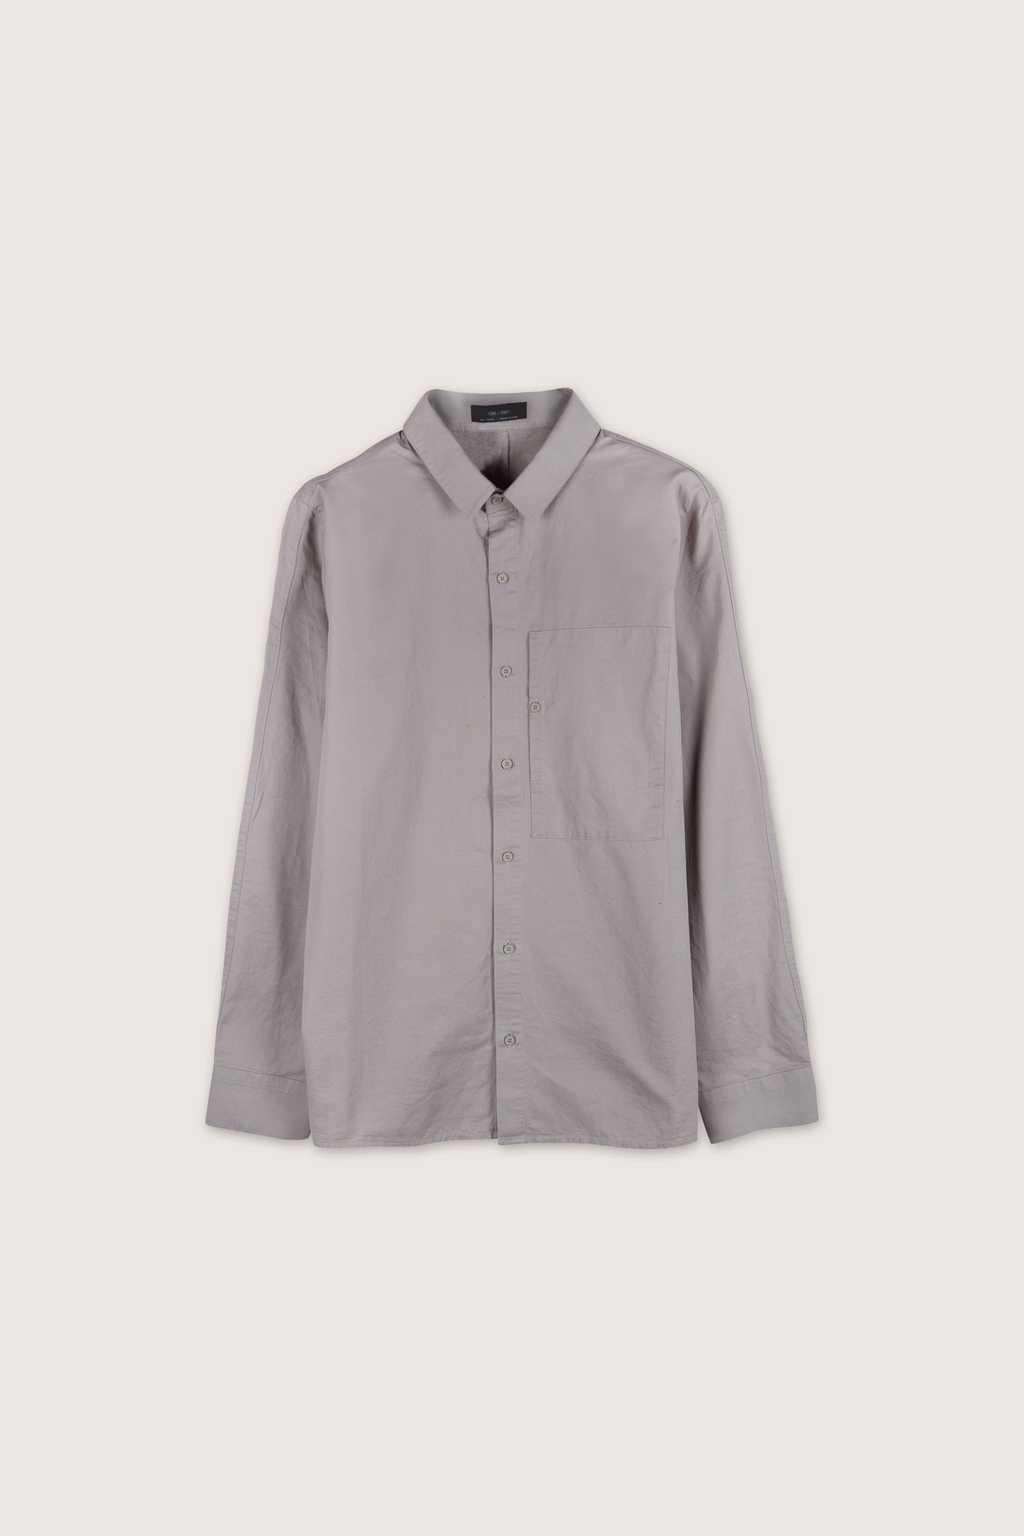 Shirt 1625 Gray 5